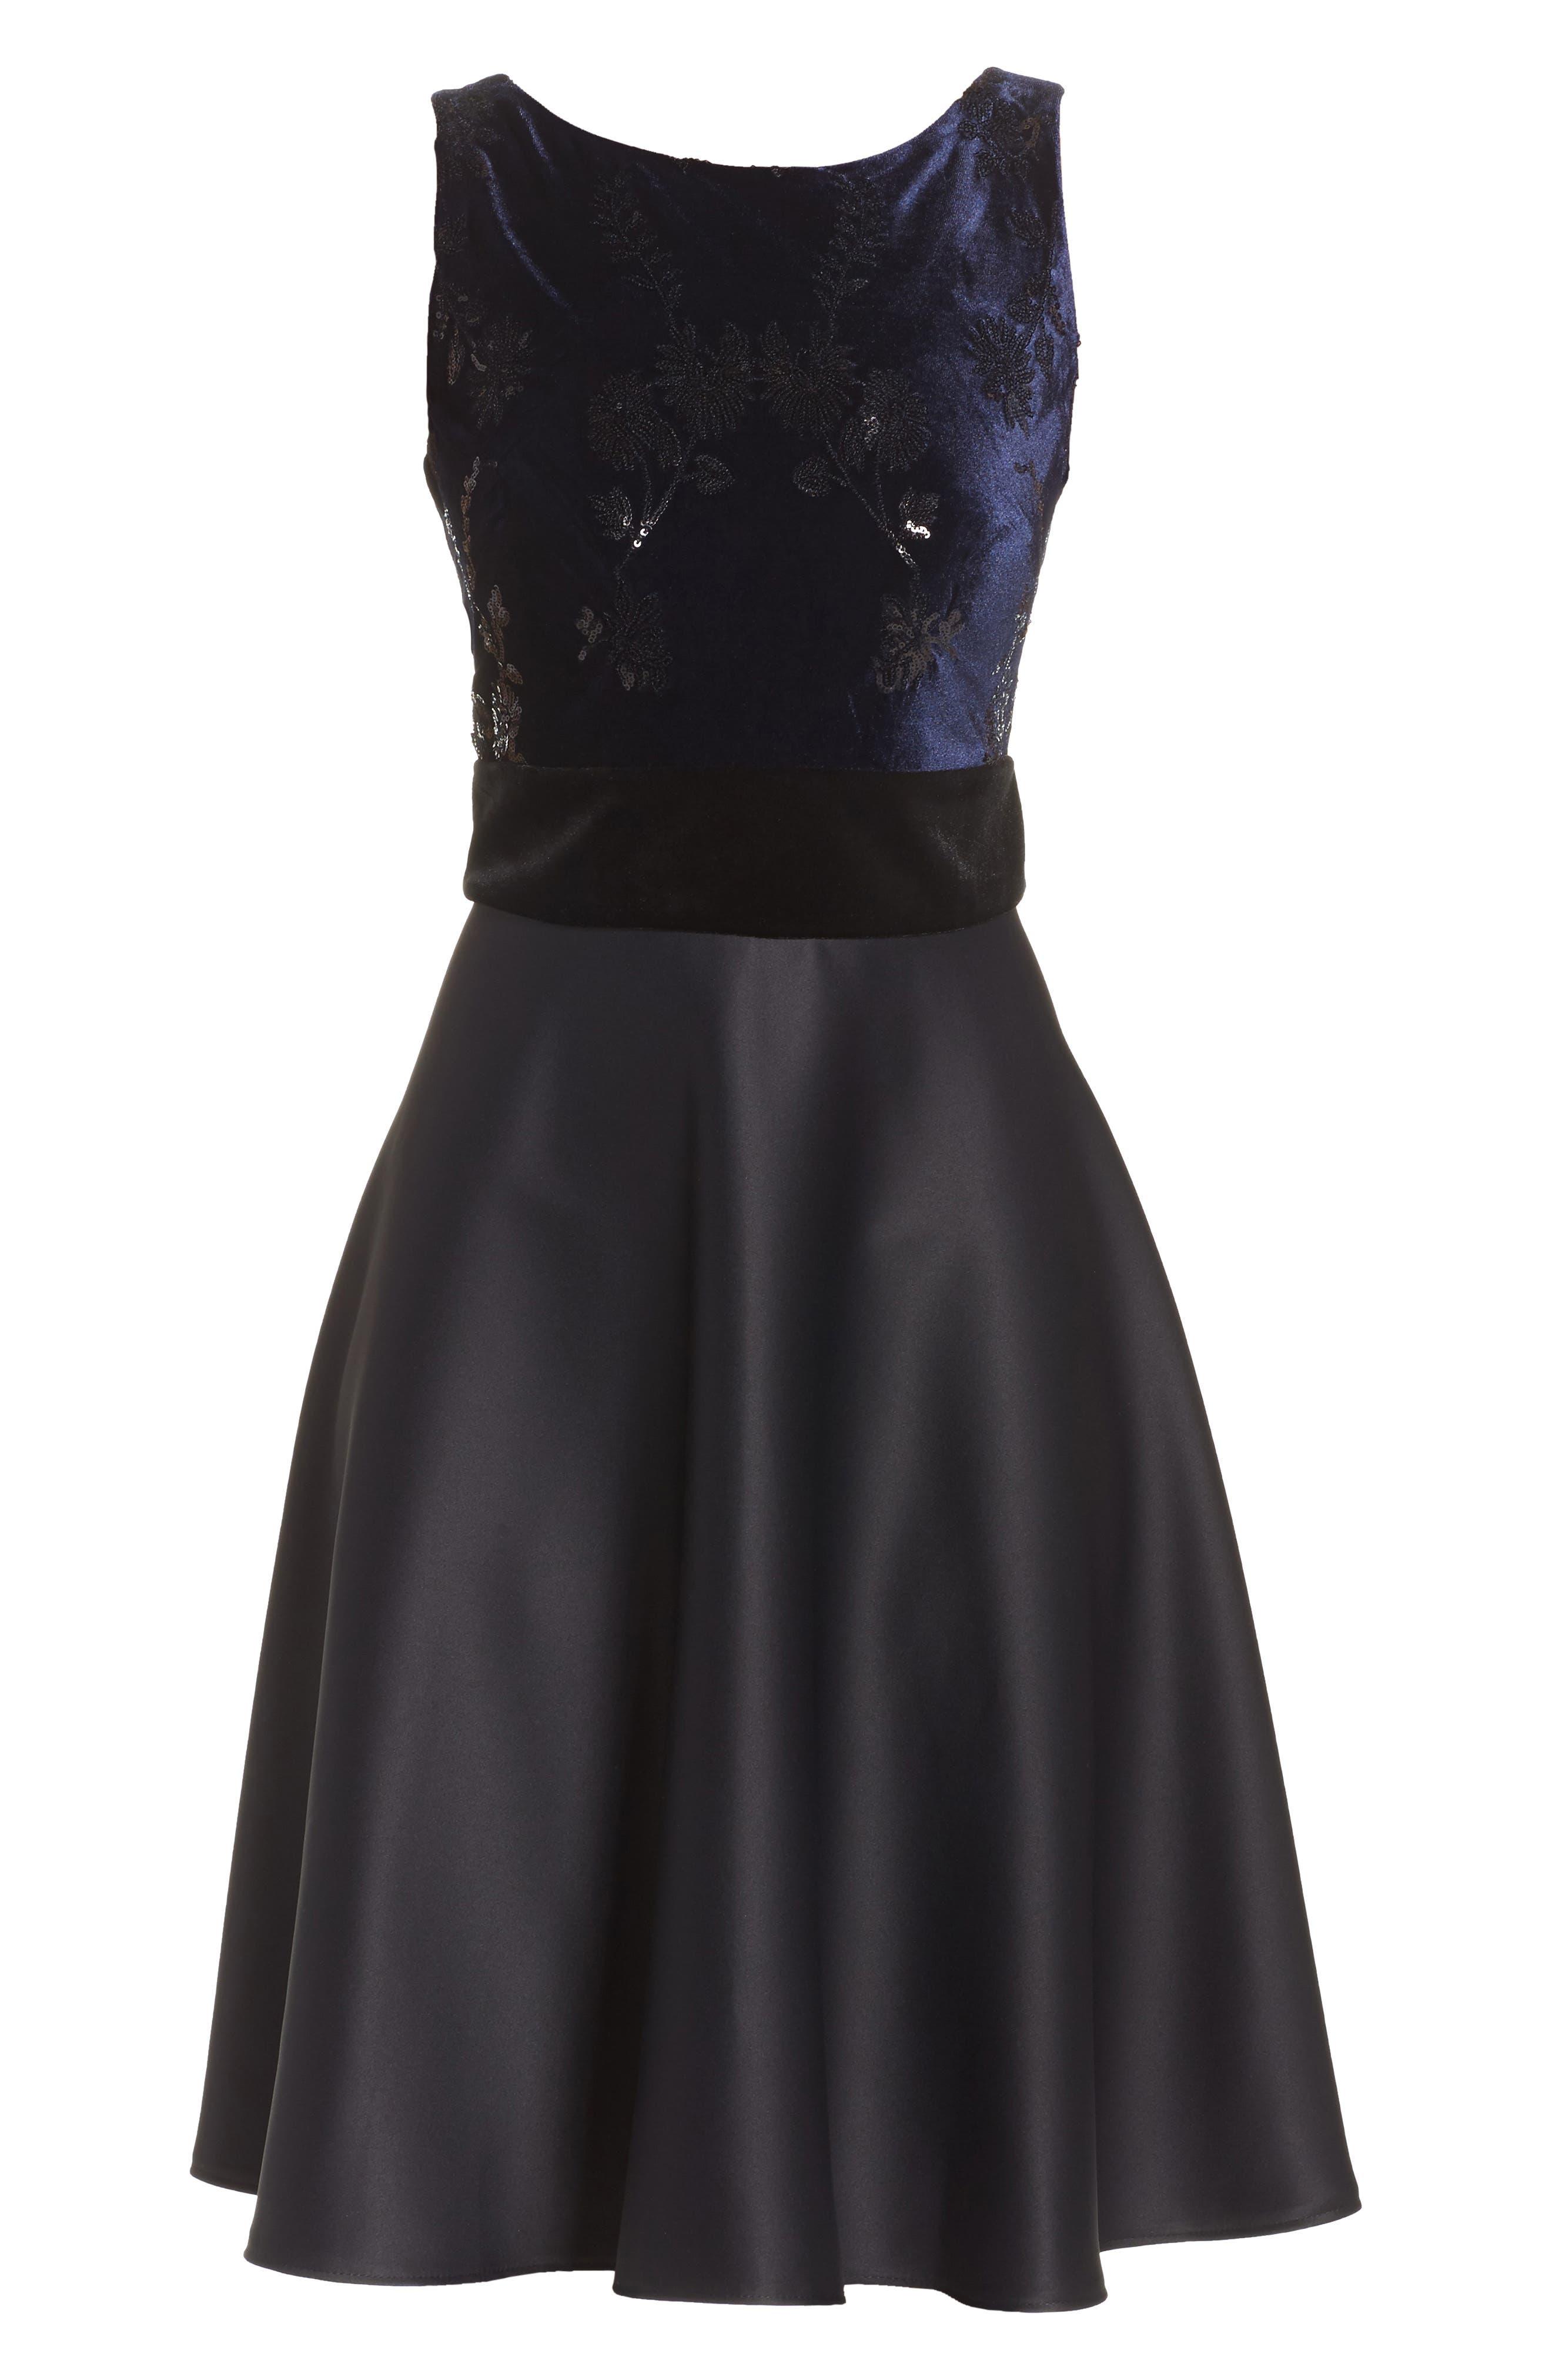 Fit & Flare Dress,                             Alternate thumbnail 6, color,                             Navy Black